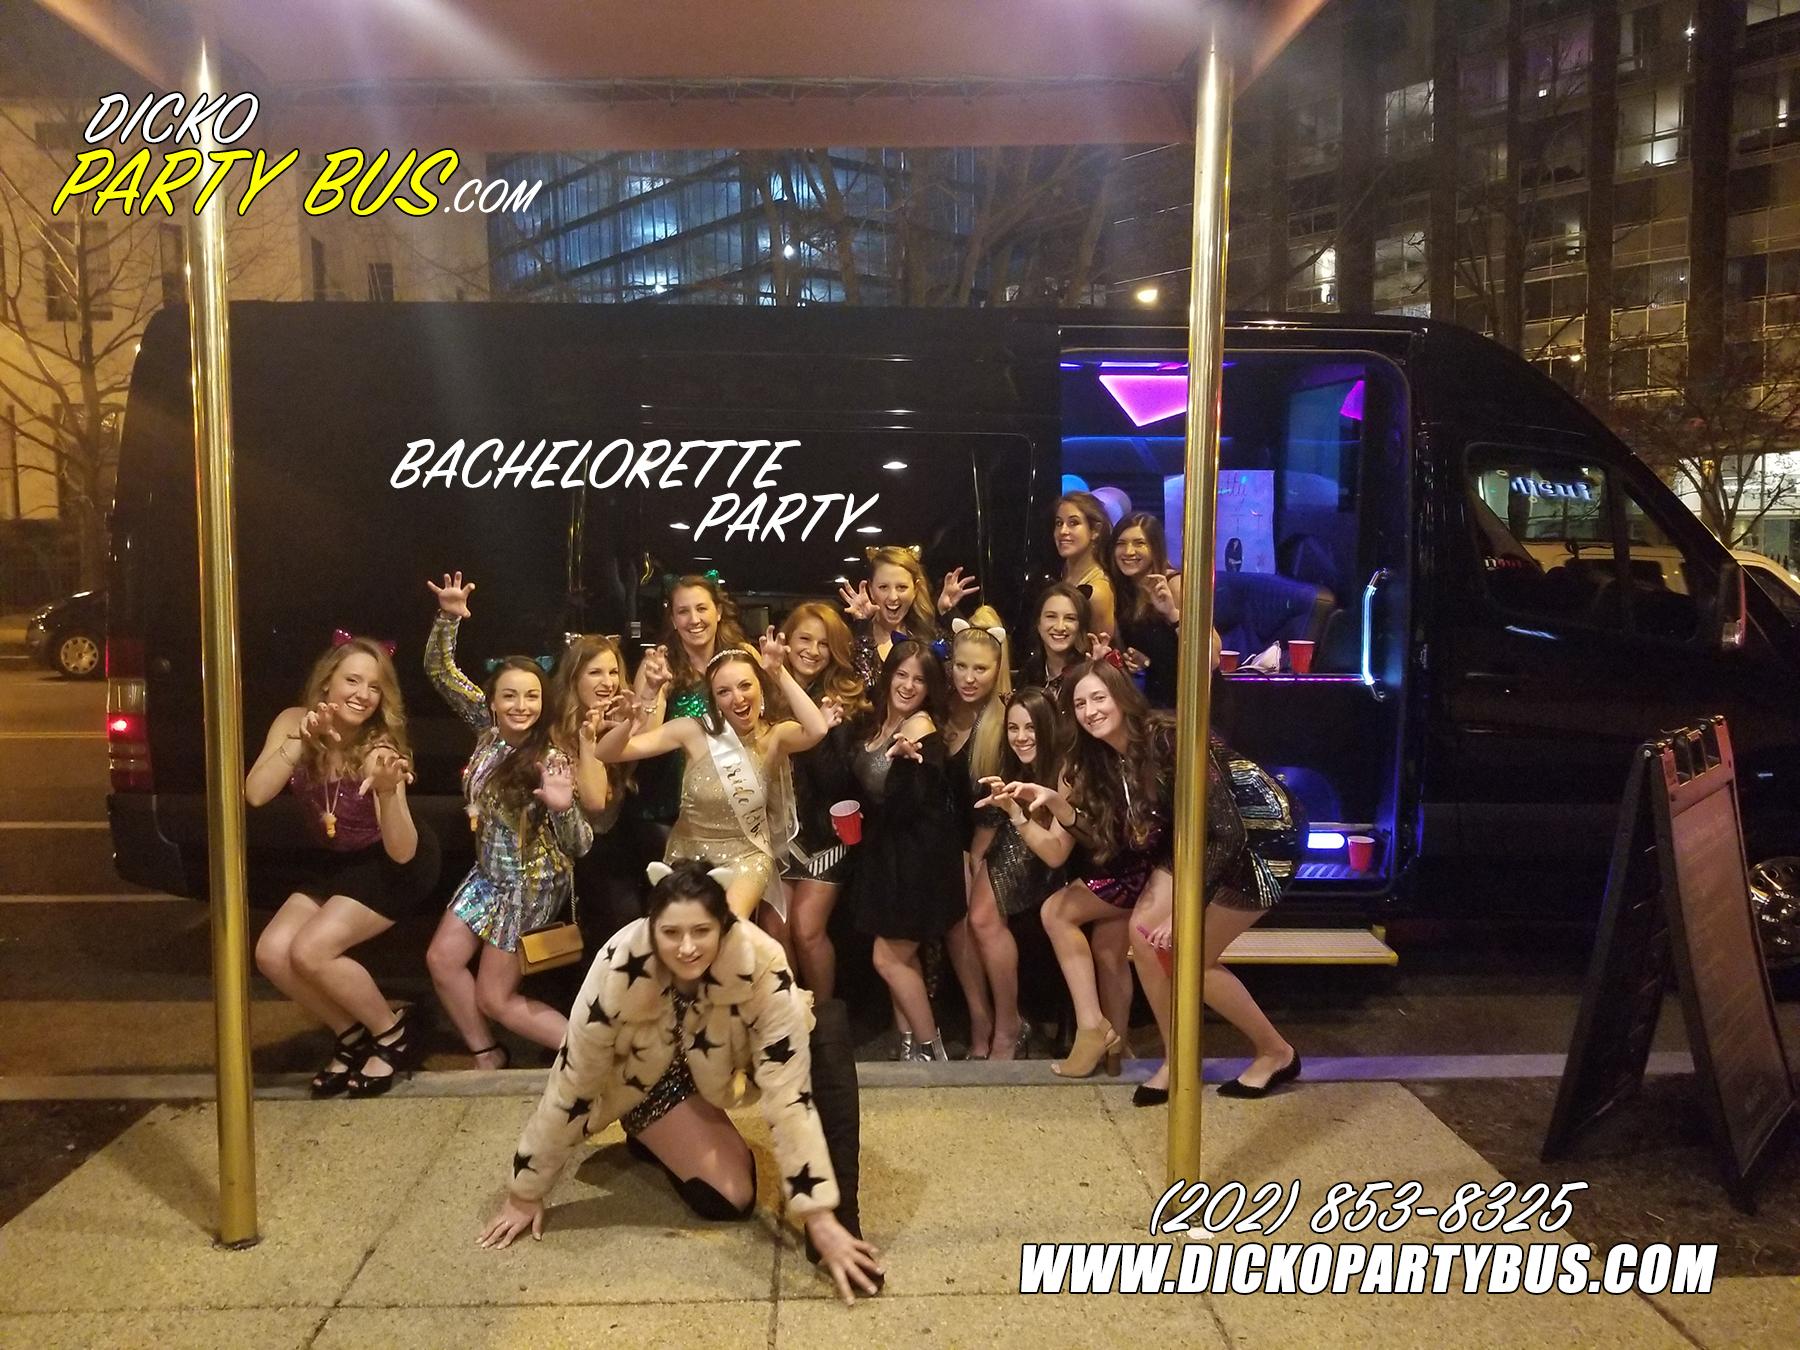 Katt's Bachelorette party